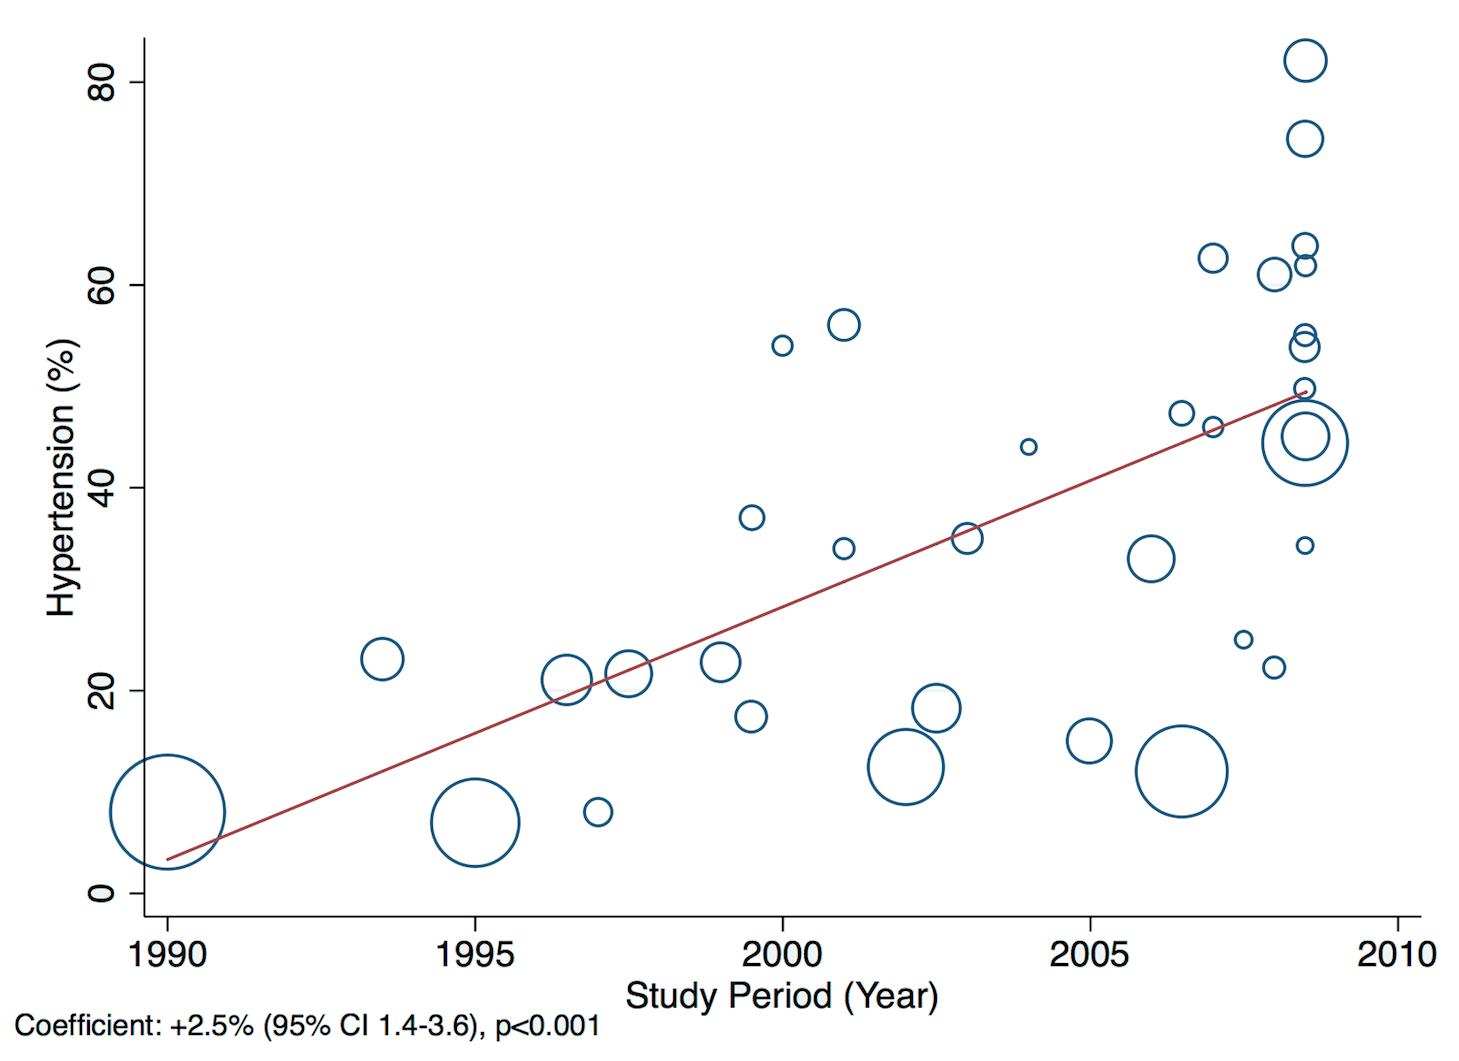 Meta-regression of hypertension against study period.